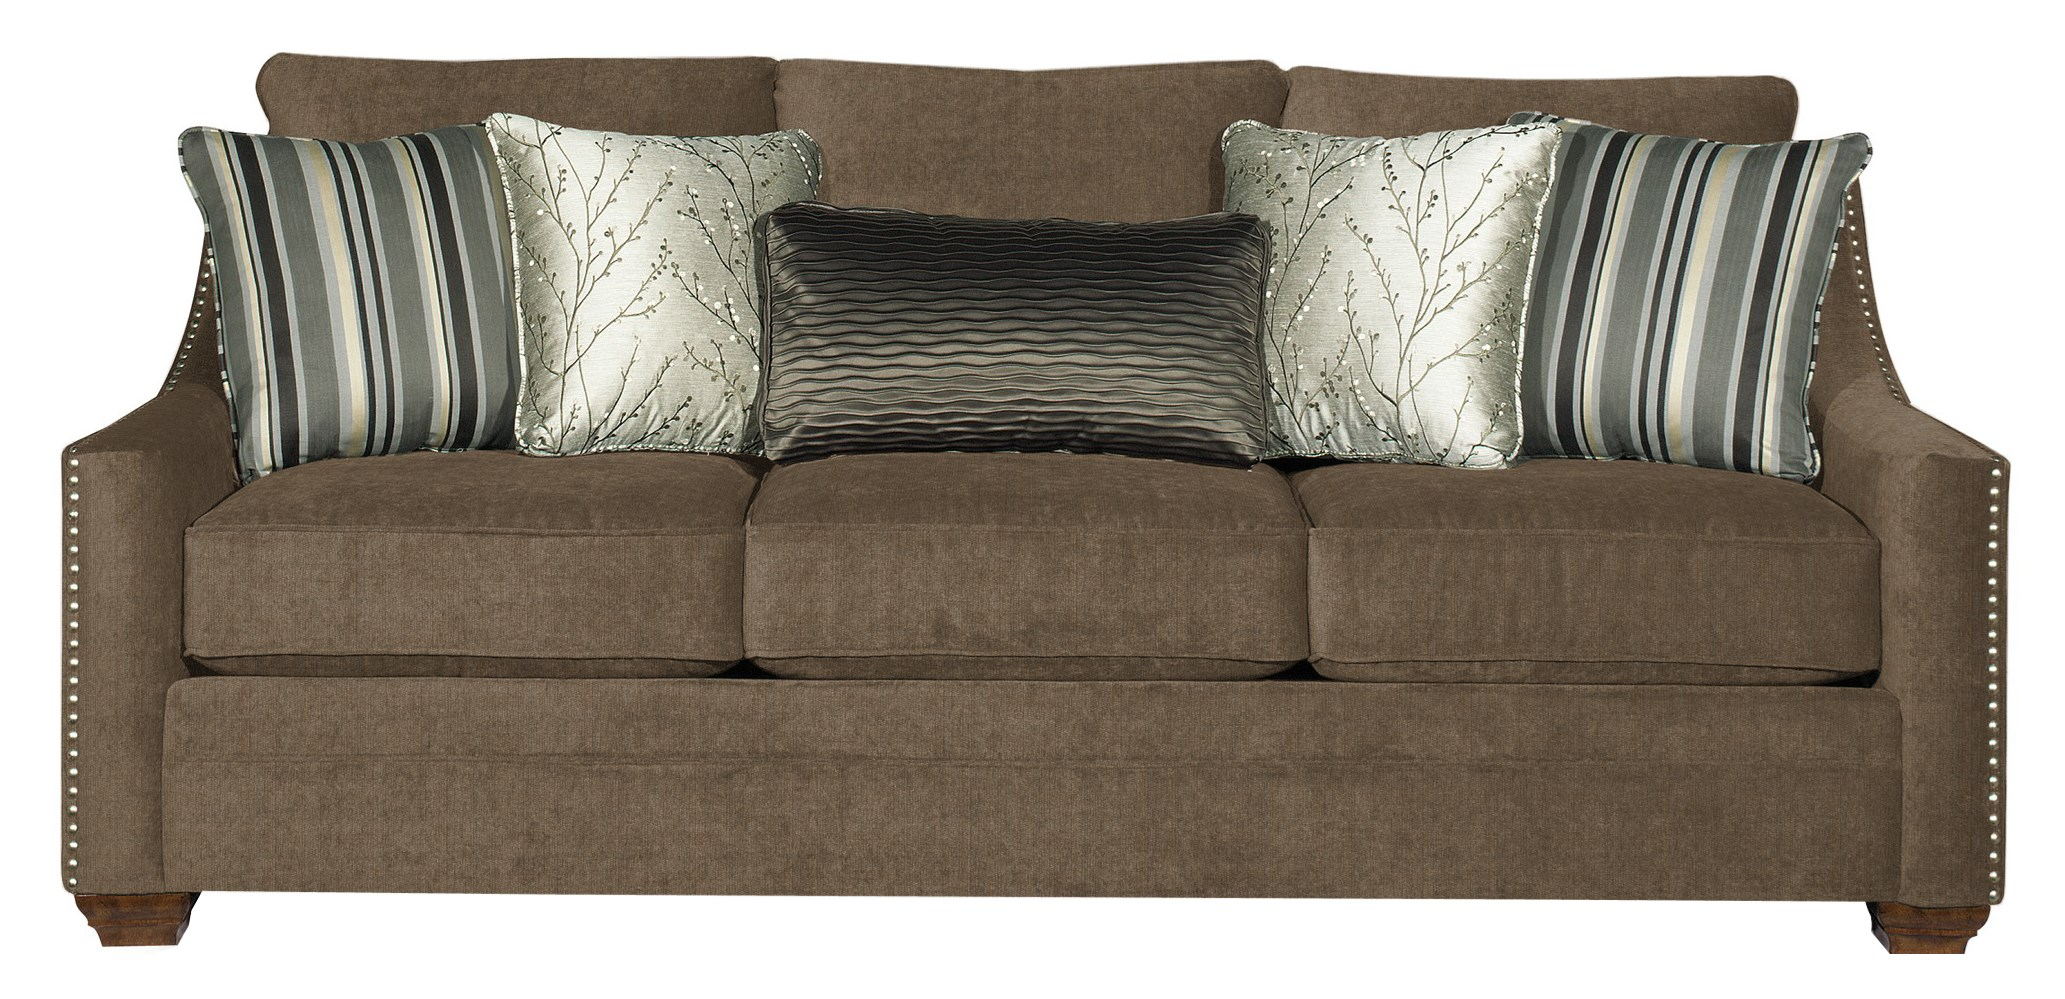 Craftmaster 7335 Sofa - Item Number: 733550-LOADED-09